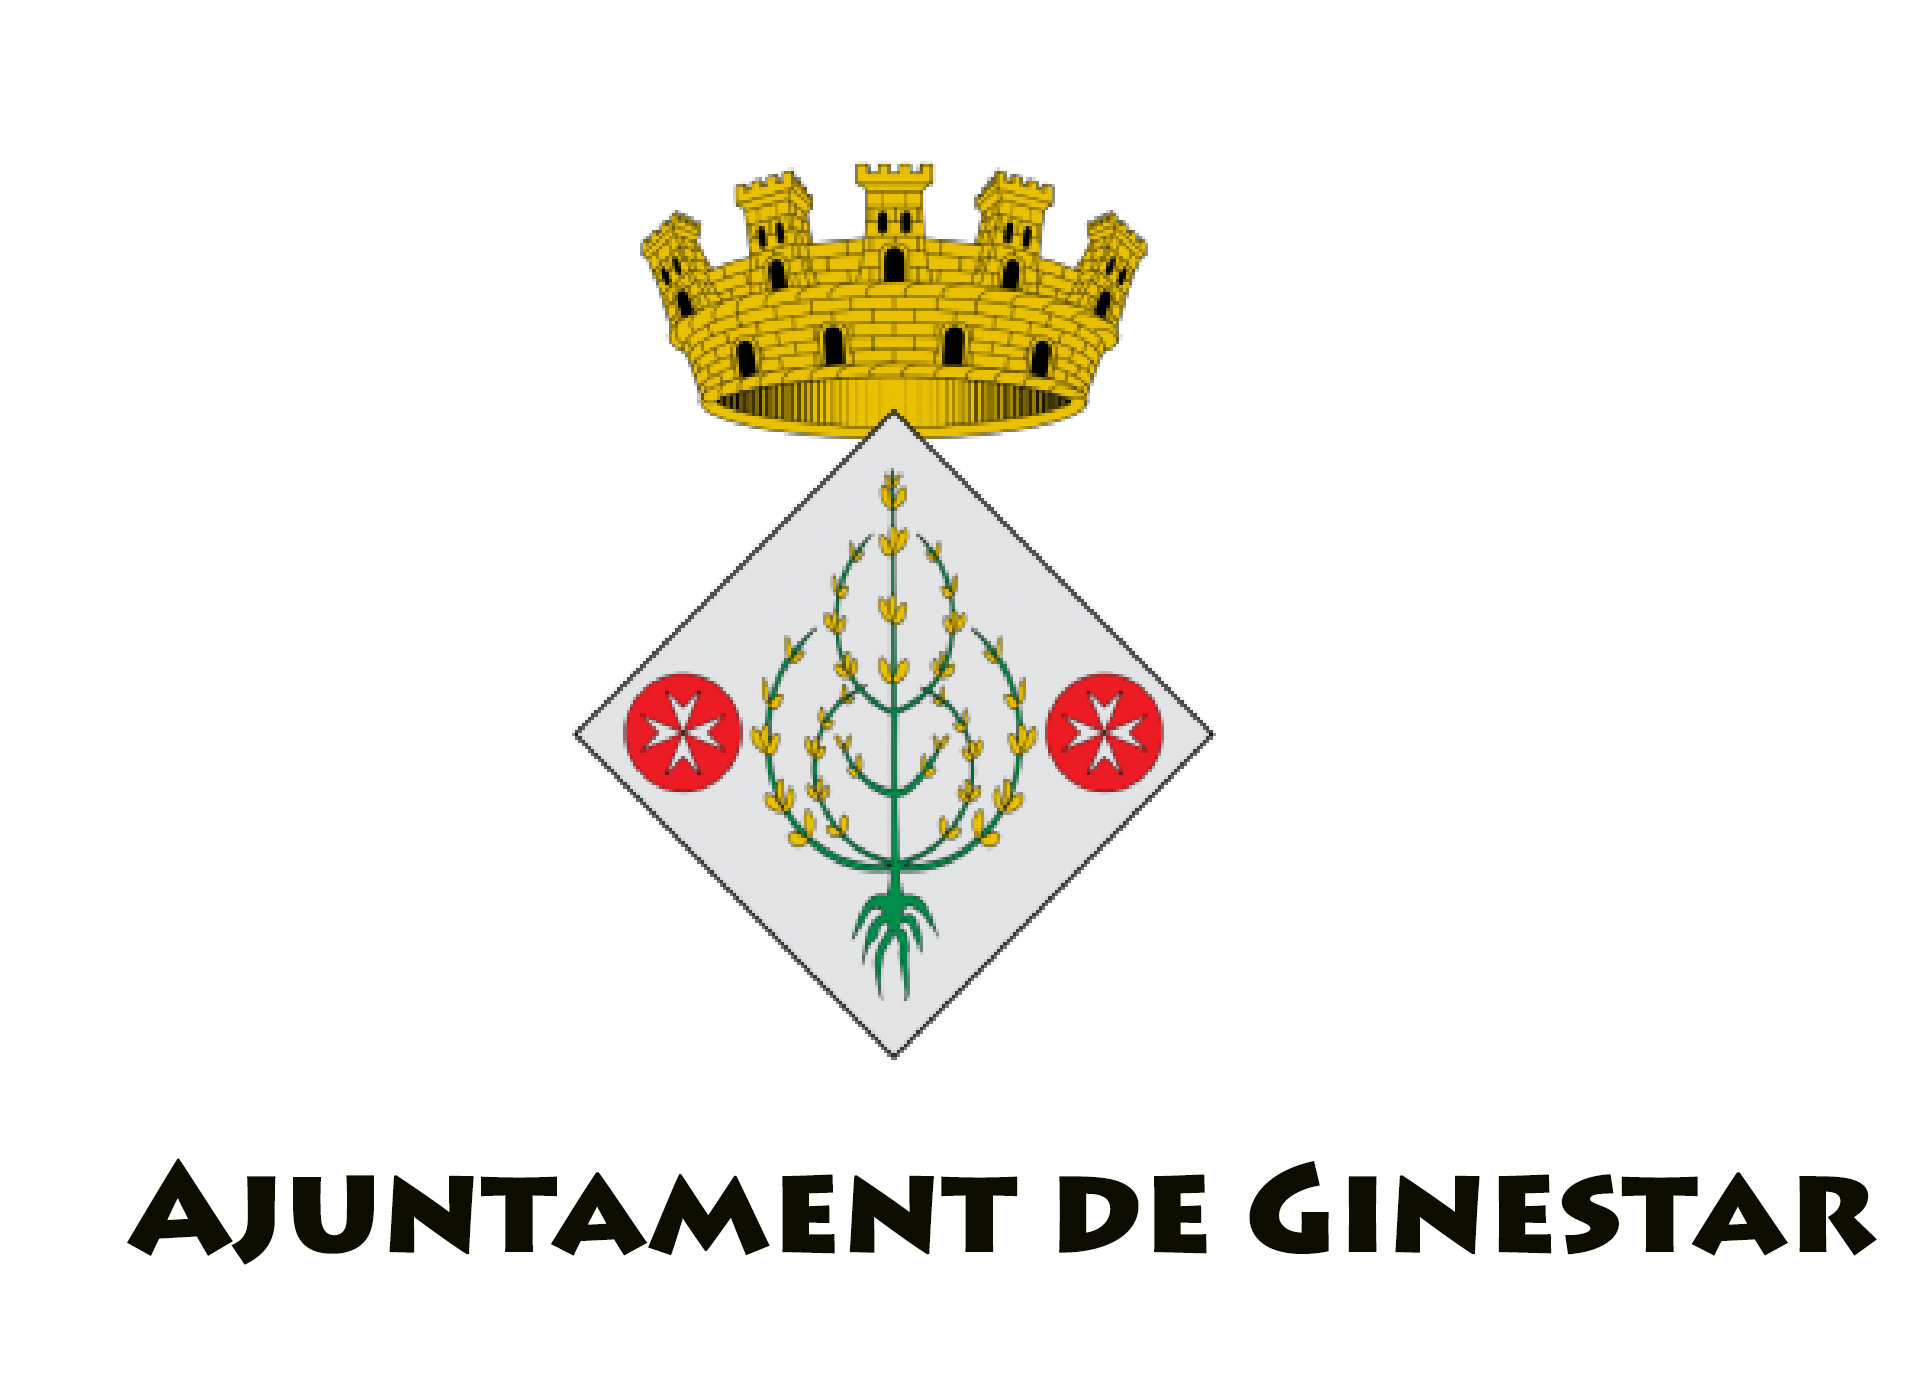 Ajuntament de Ginestar